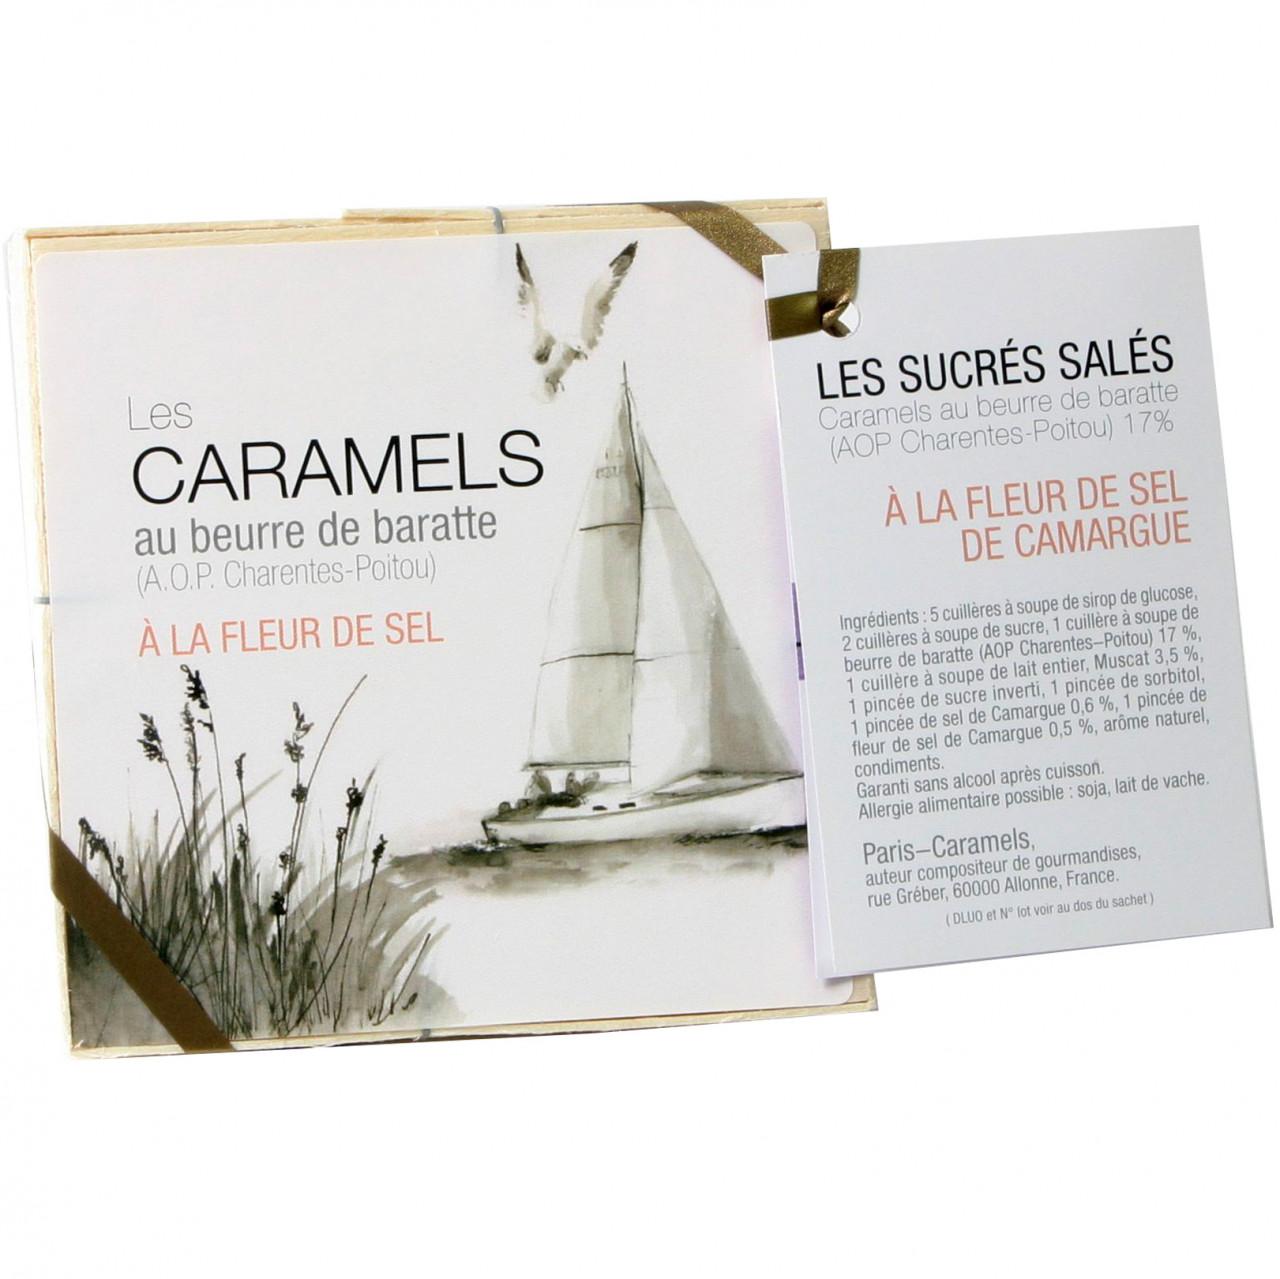 Karamellbonbon, Frankreich, Guérande Salz, salted caramels, gesalzene Karamellen, gesalzene Karamellbonbons -  - Chocolats-De-Luxe